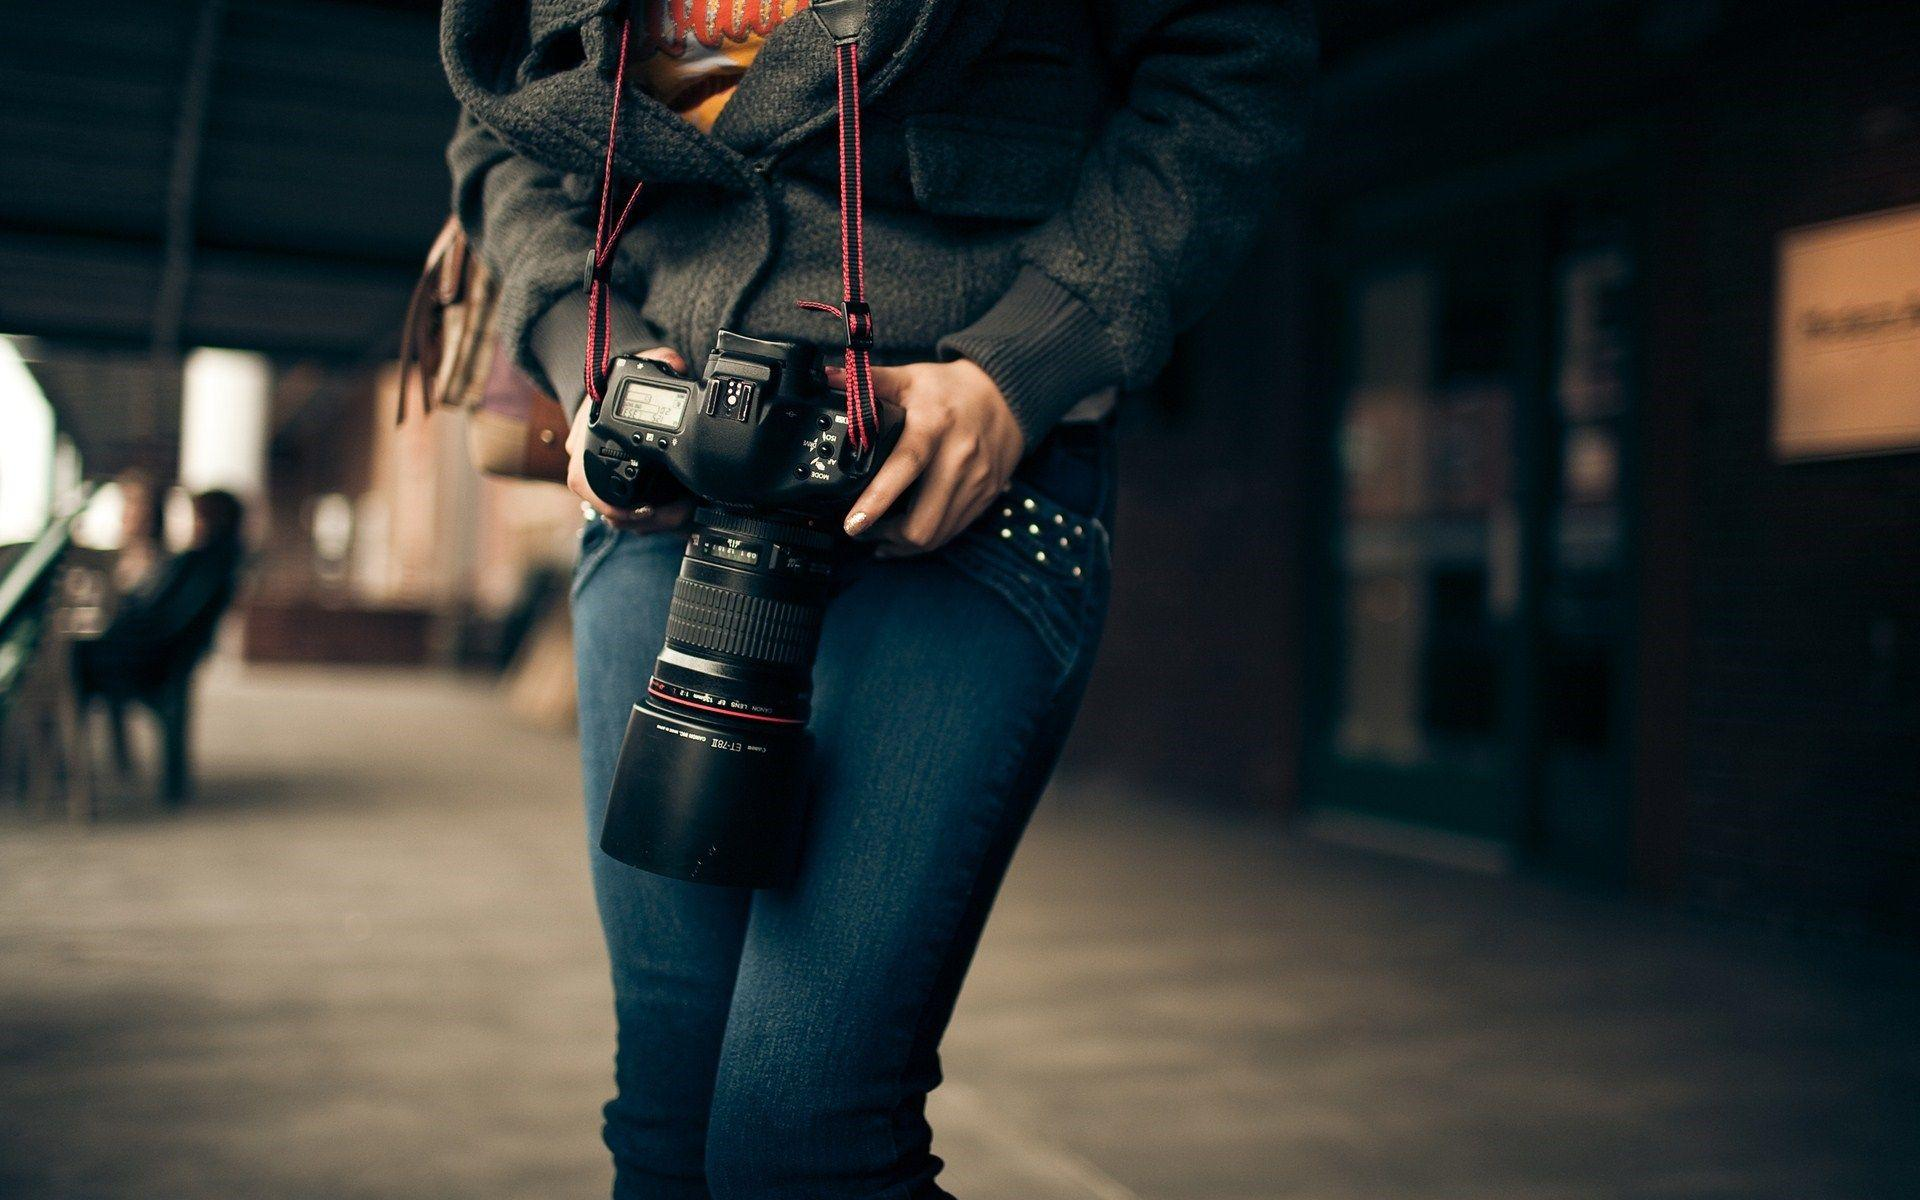 camera, lens, station, photo, nikon, girl, photographer, hd, wallpaper